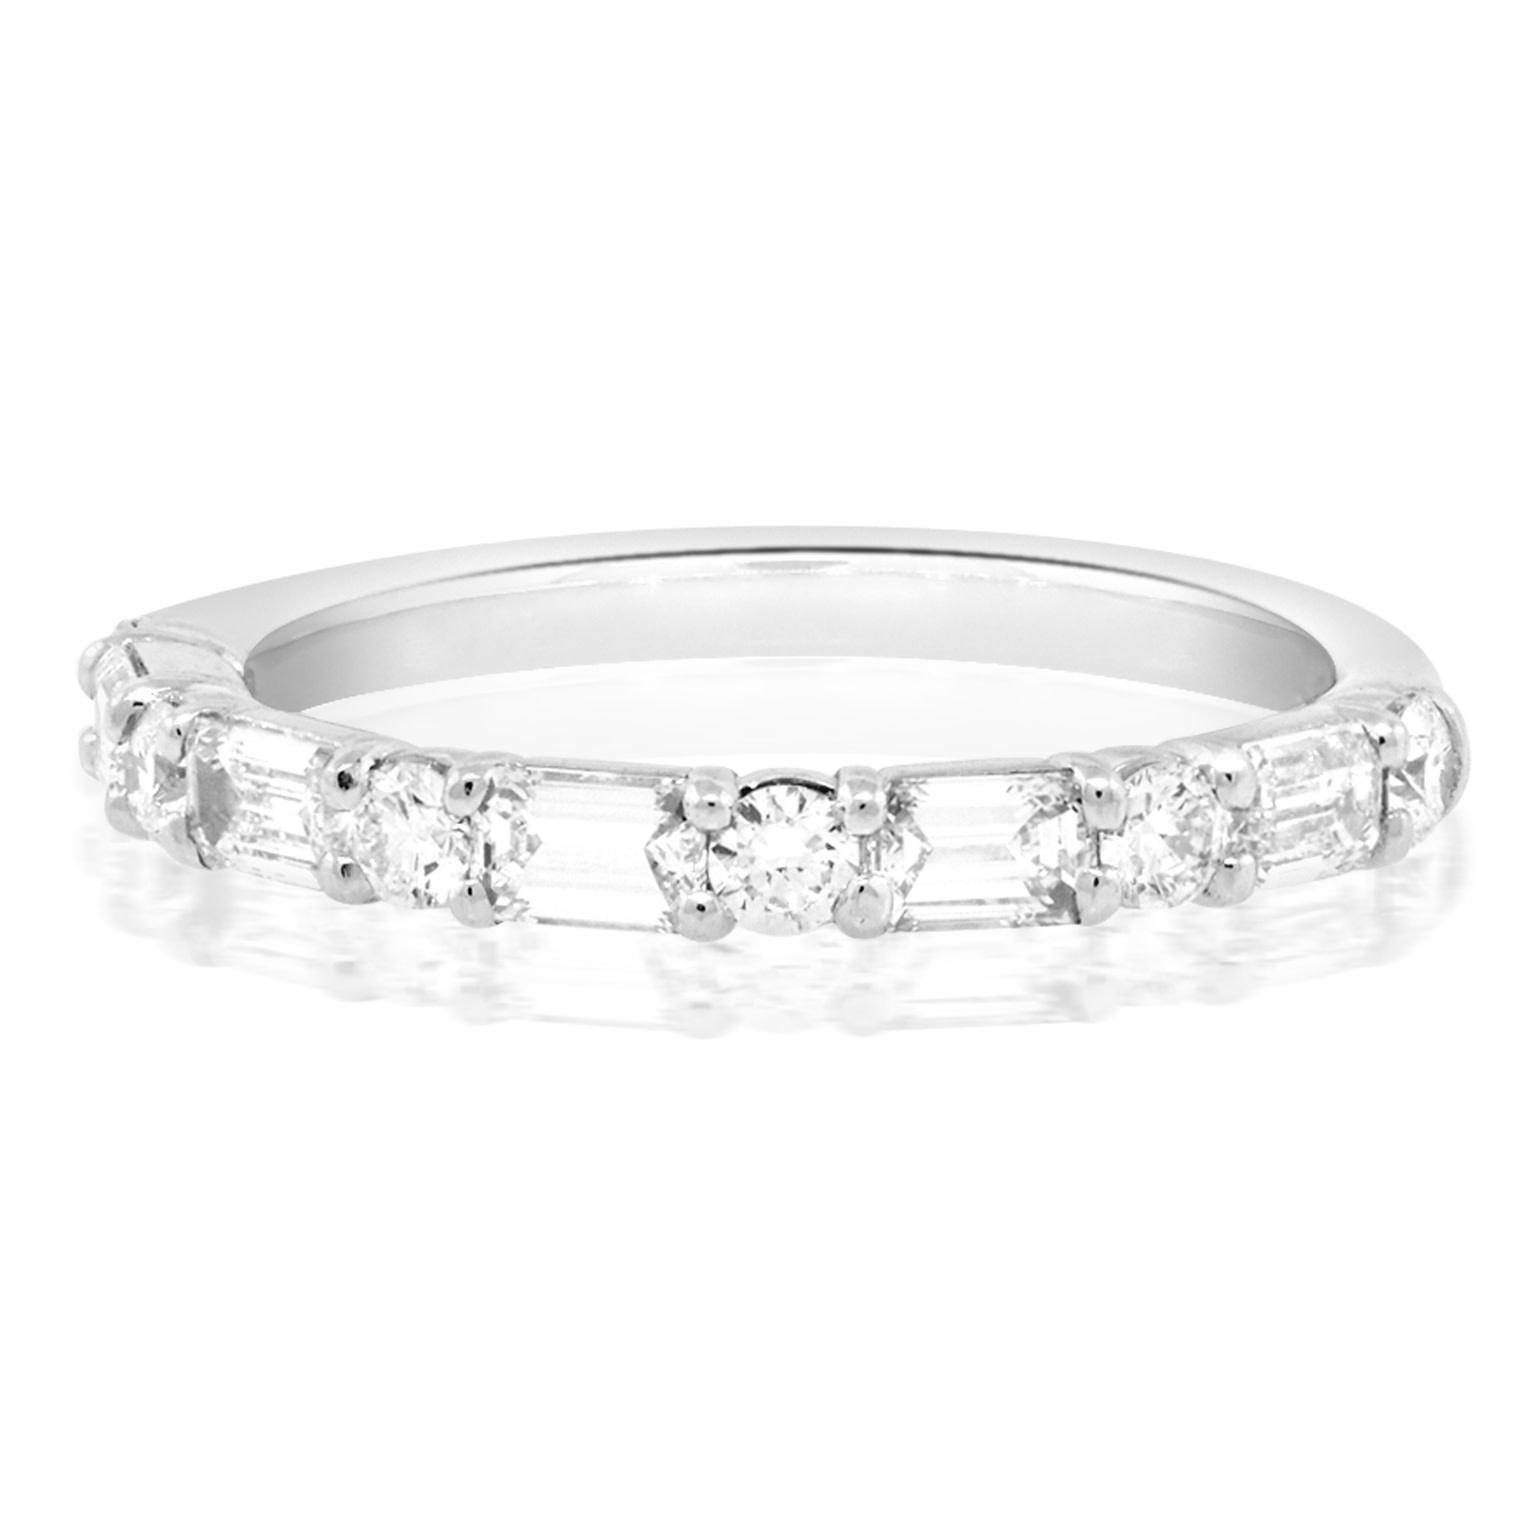 Trabert Goldsmiths Round and Baguette Diamond Garbo Ring